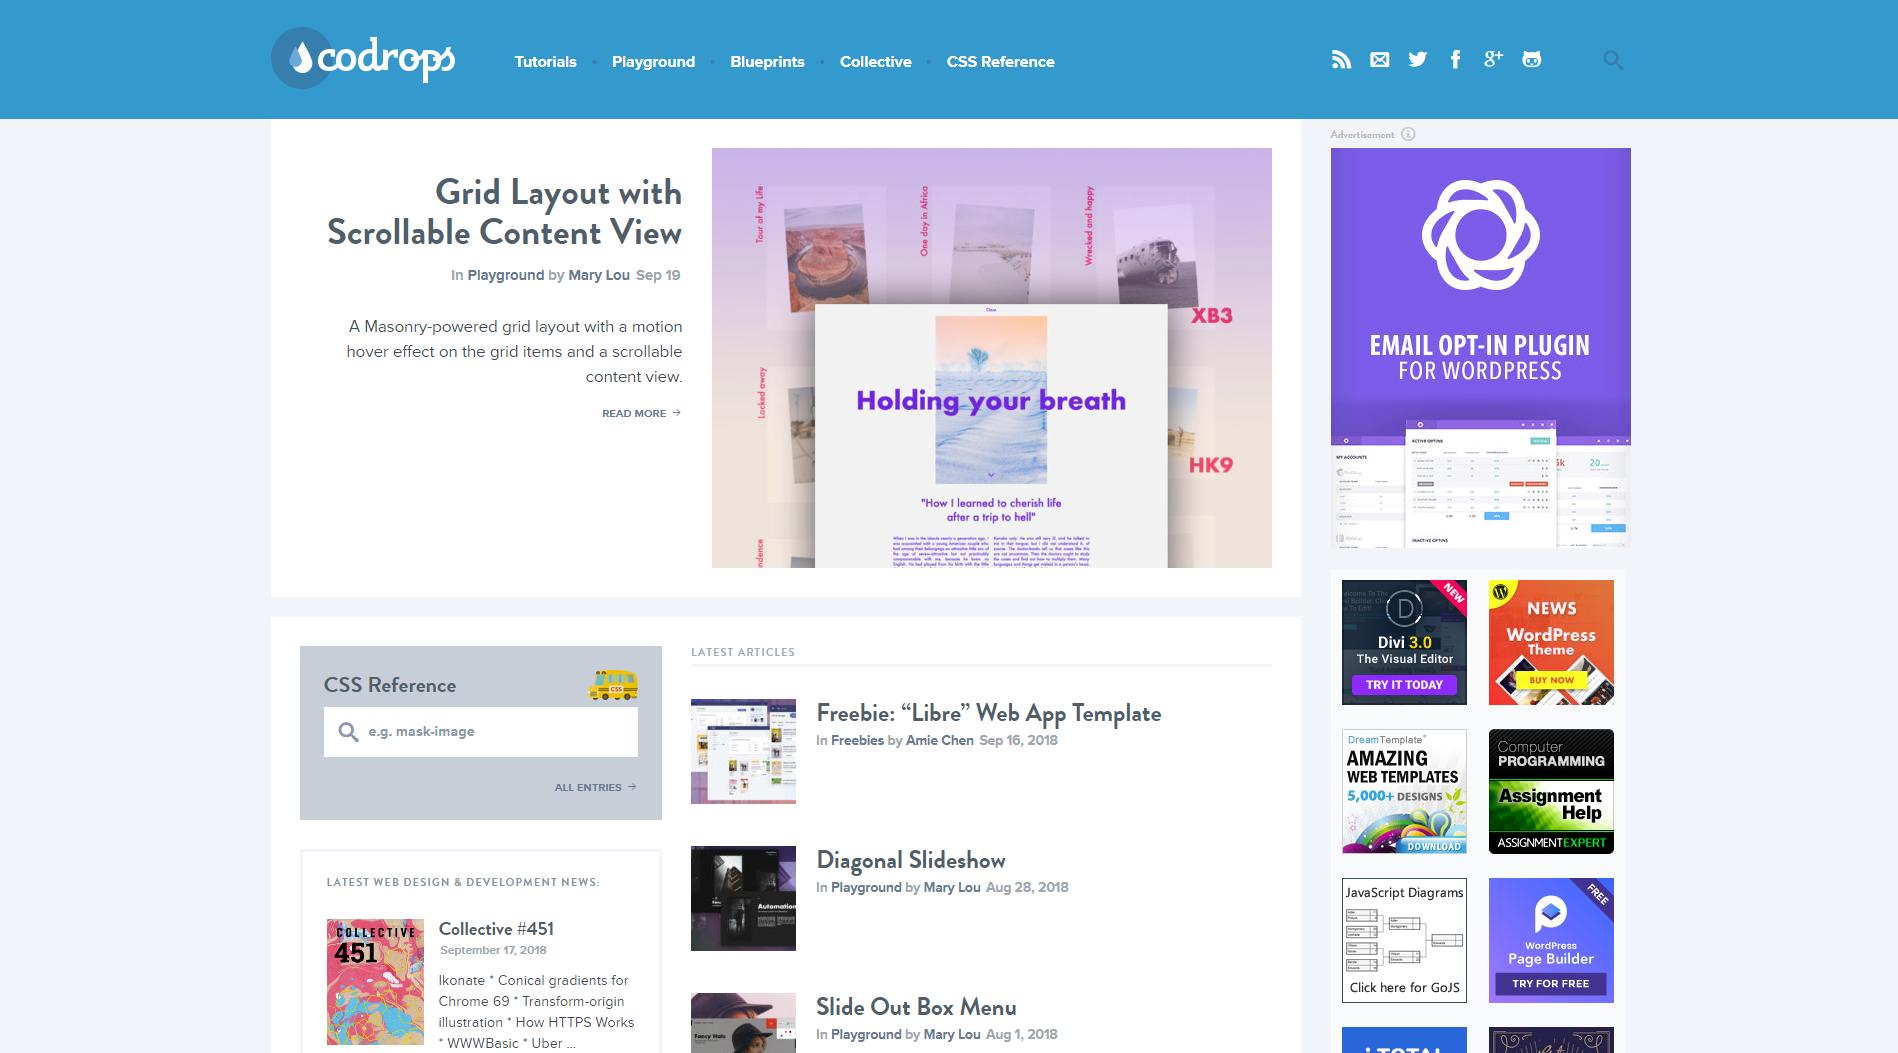 codrops homepage